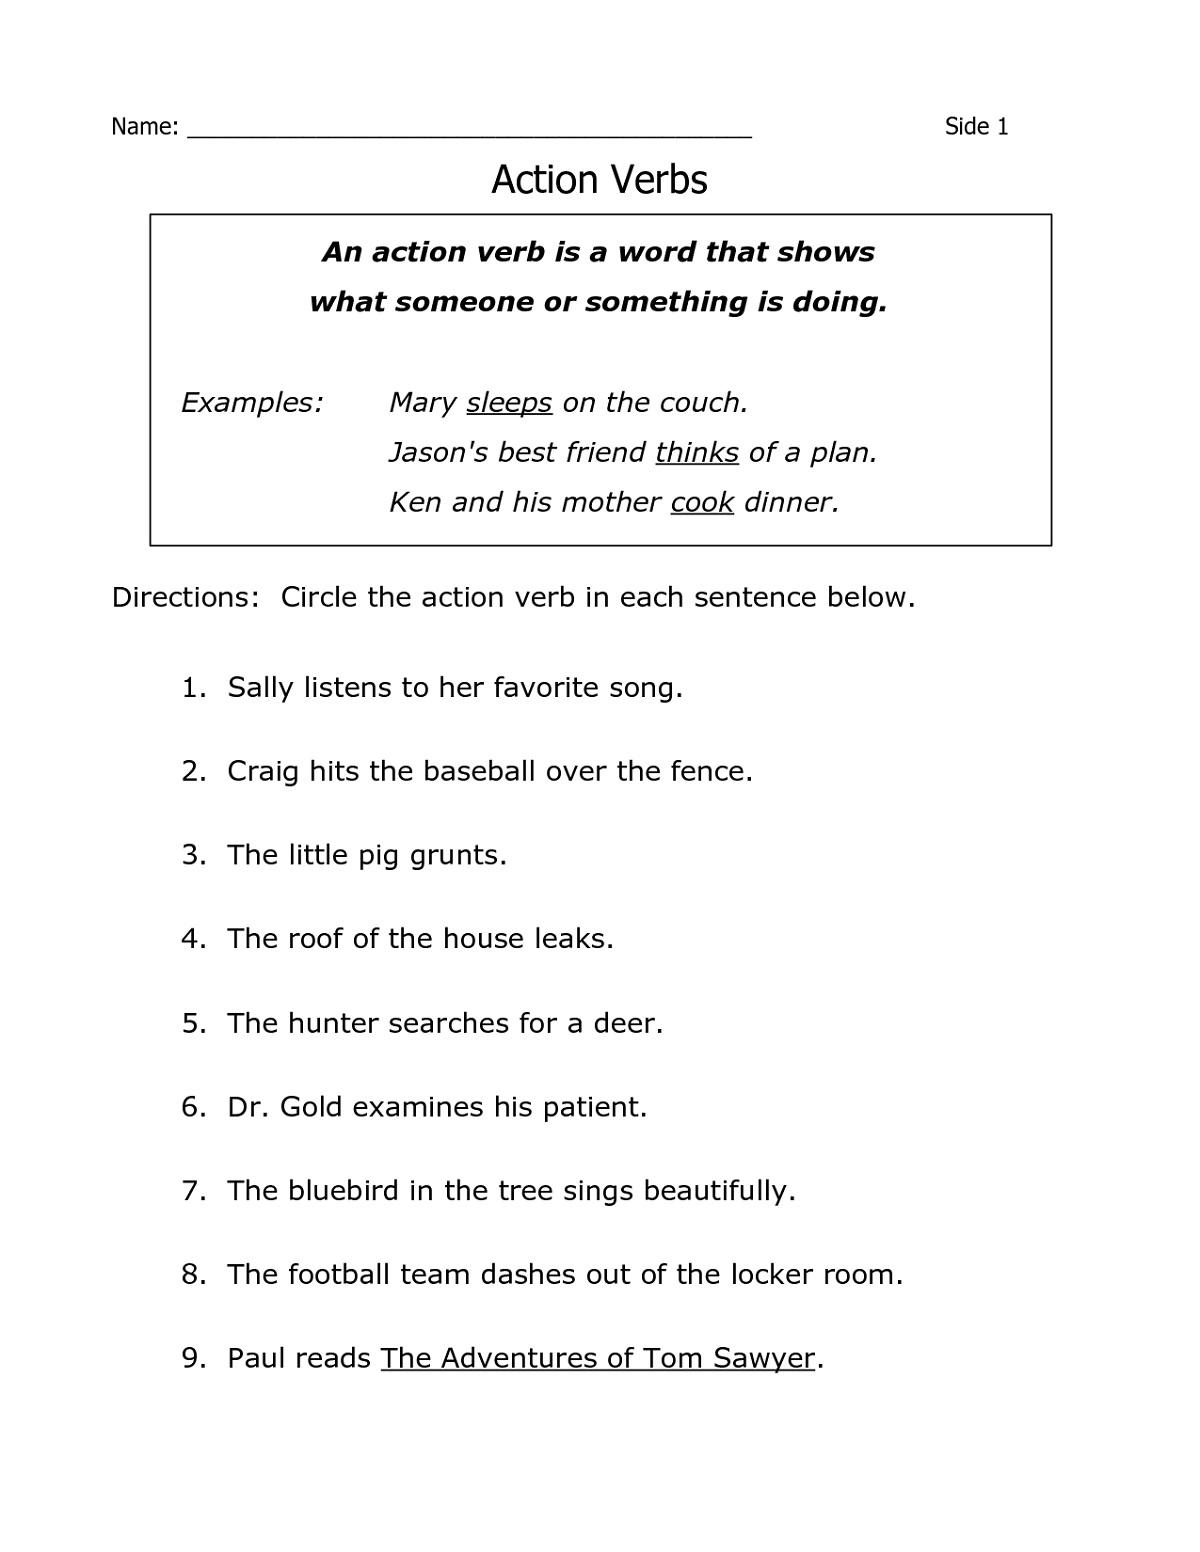 Year 4 English Worksheets Printable Action Verbs